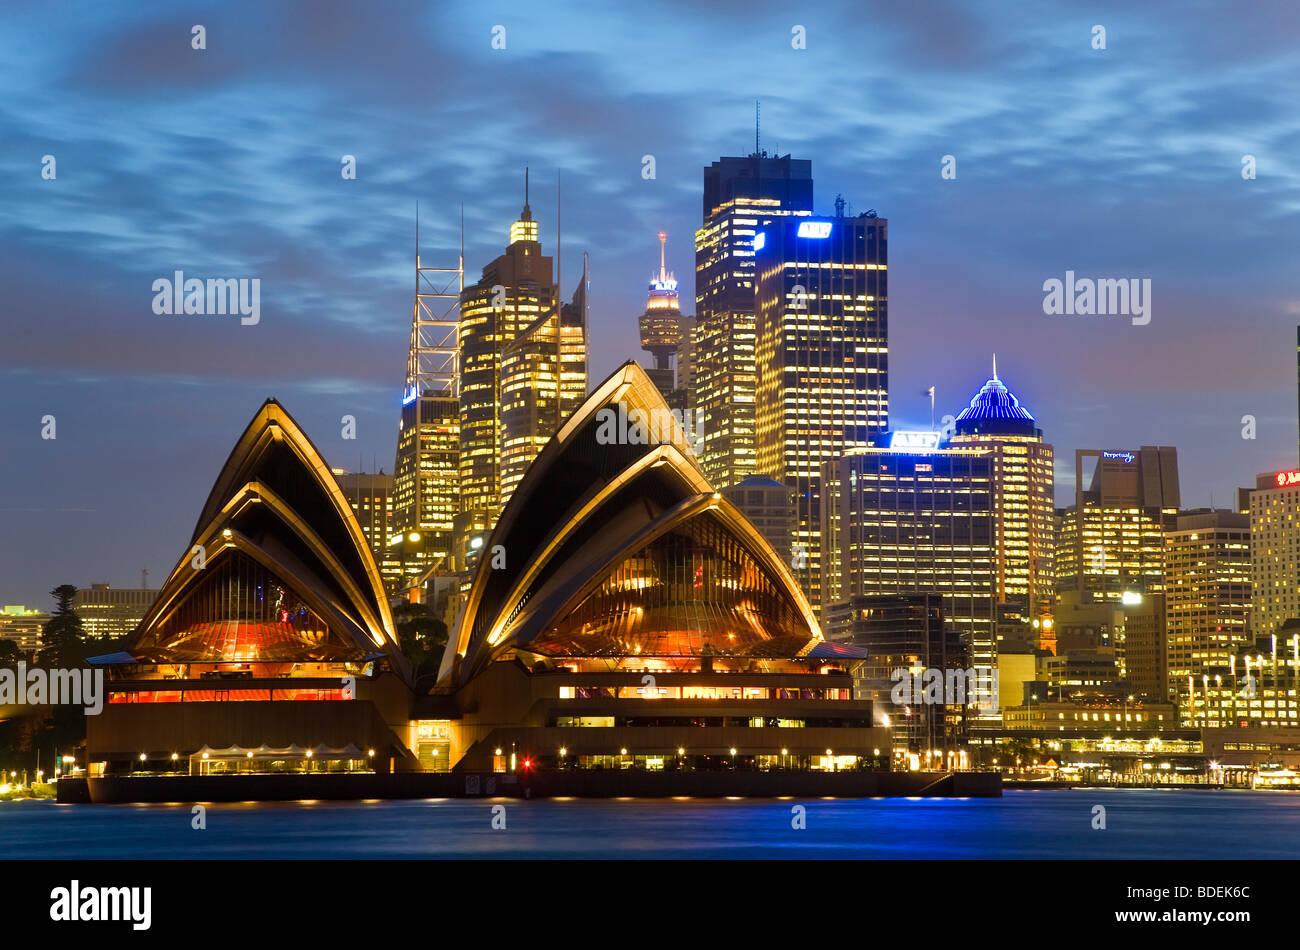 Australia, Sydney, vista sul porto di Sydney a Sydney Opera House & skyline al tramonto Immagini Stock